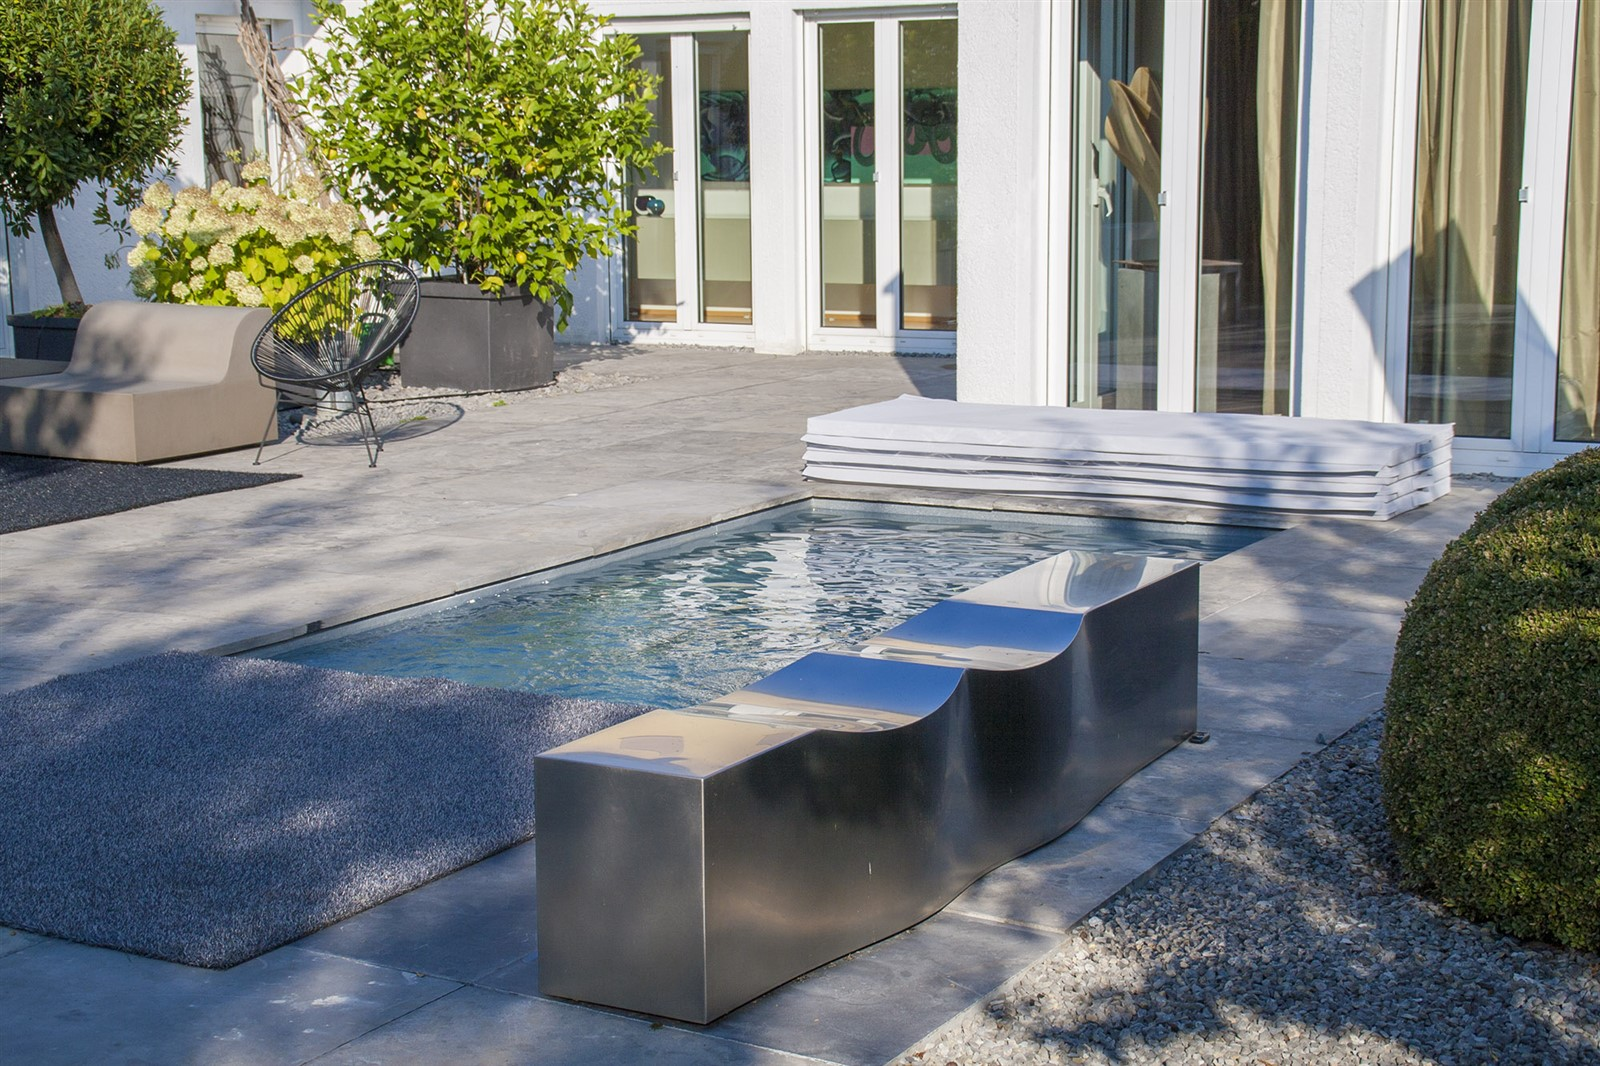 Gärten & Pools Sven Studer | C- Side der mini Garten Pool